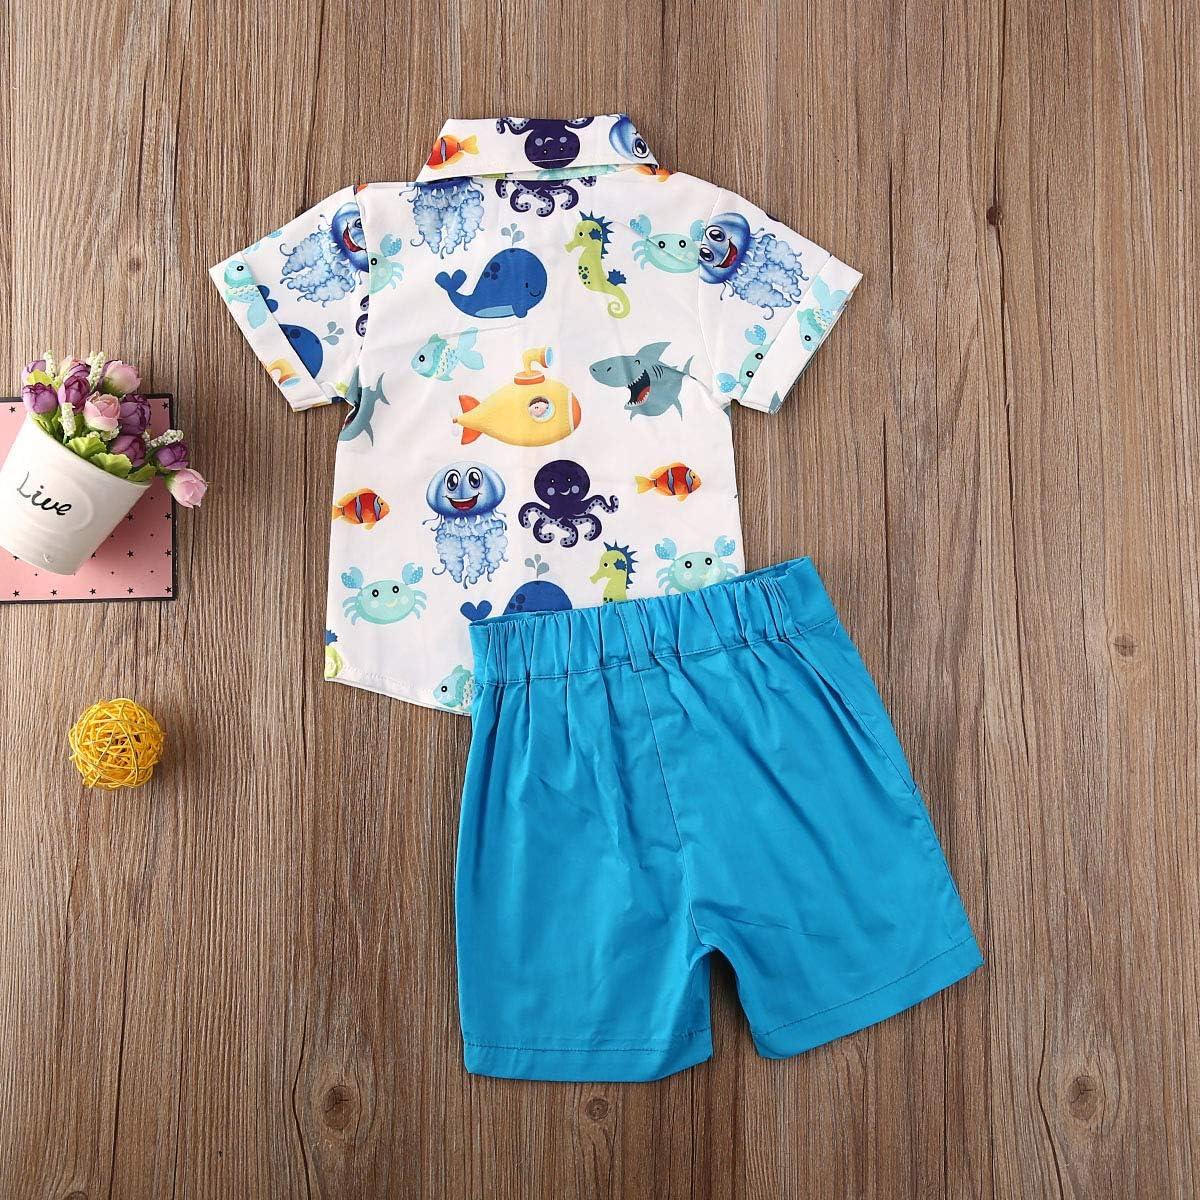 Baby Boys Button Down Shirt Solid Shorts Clothes Set 2Pcs Flamingo Dinosaur Tops and Shorts Kids Outfits